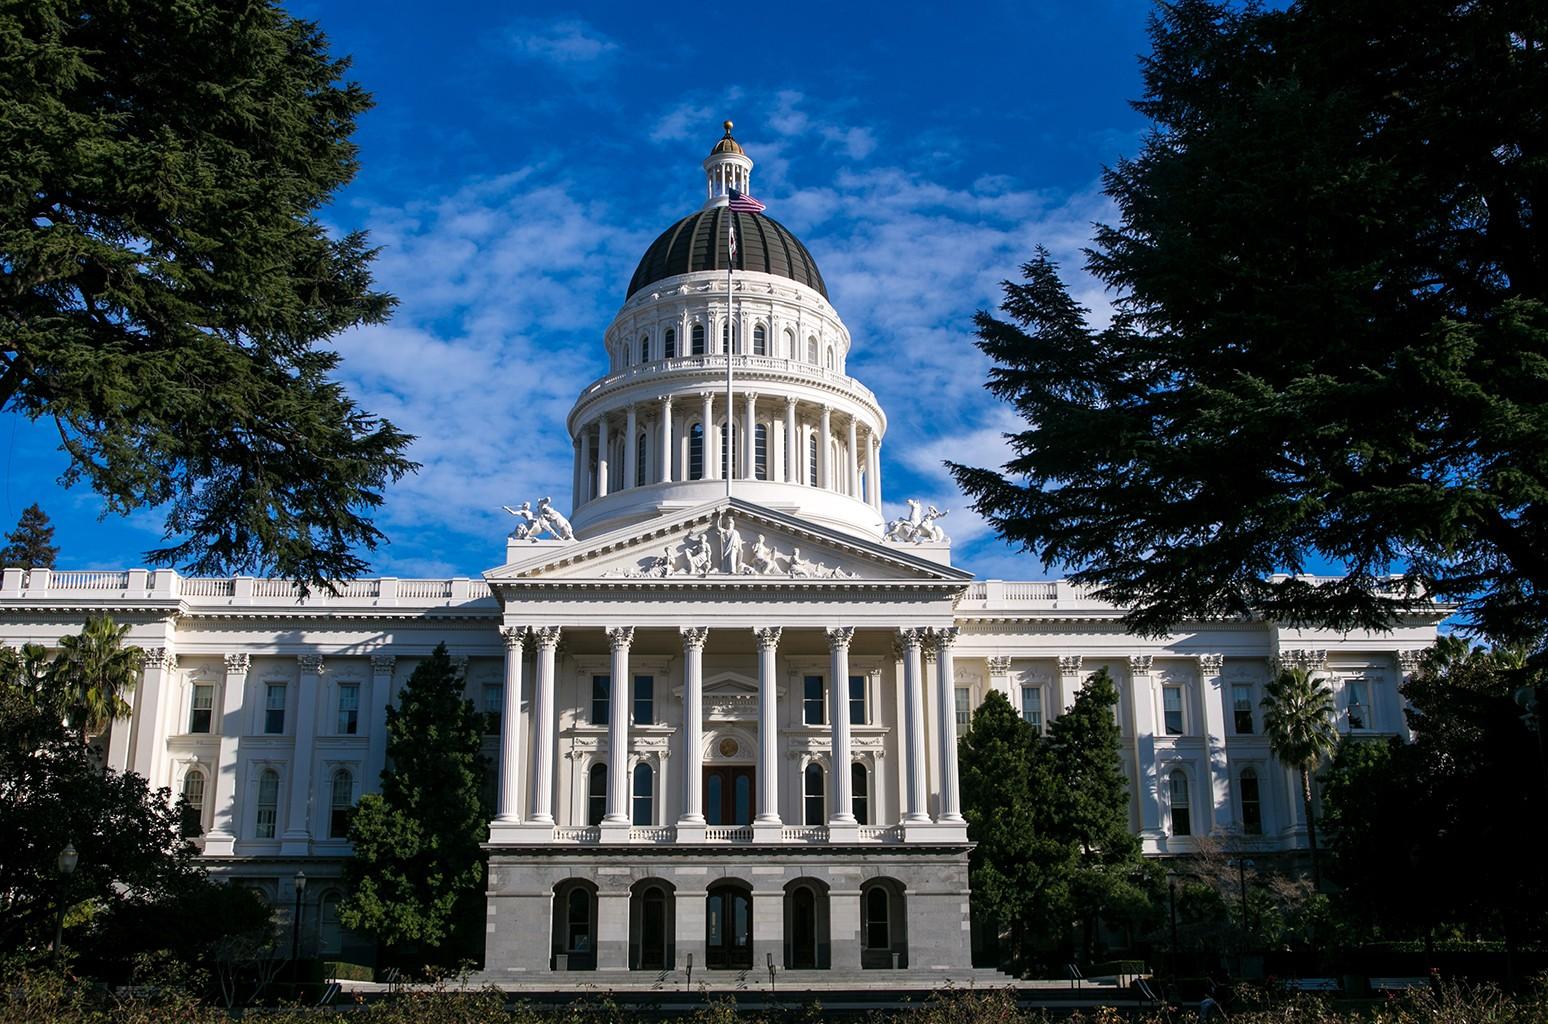 State Capitol building in Sacramento, Calif.